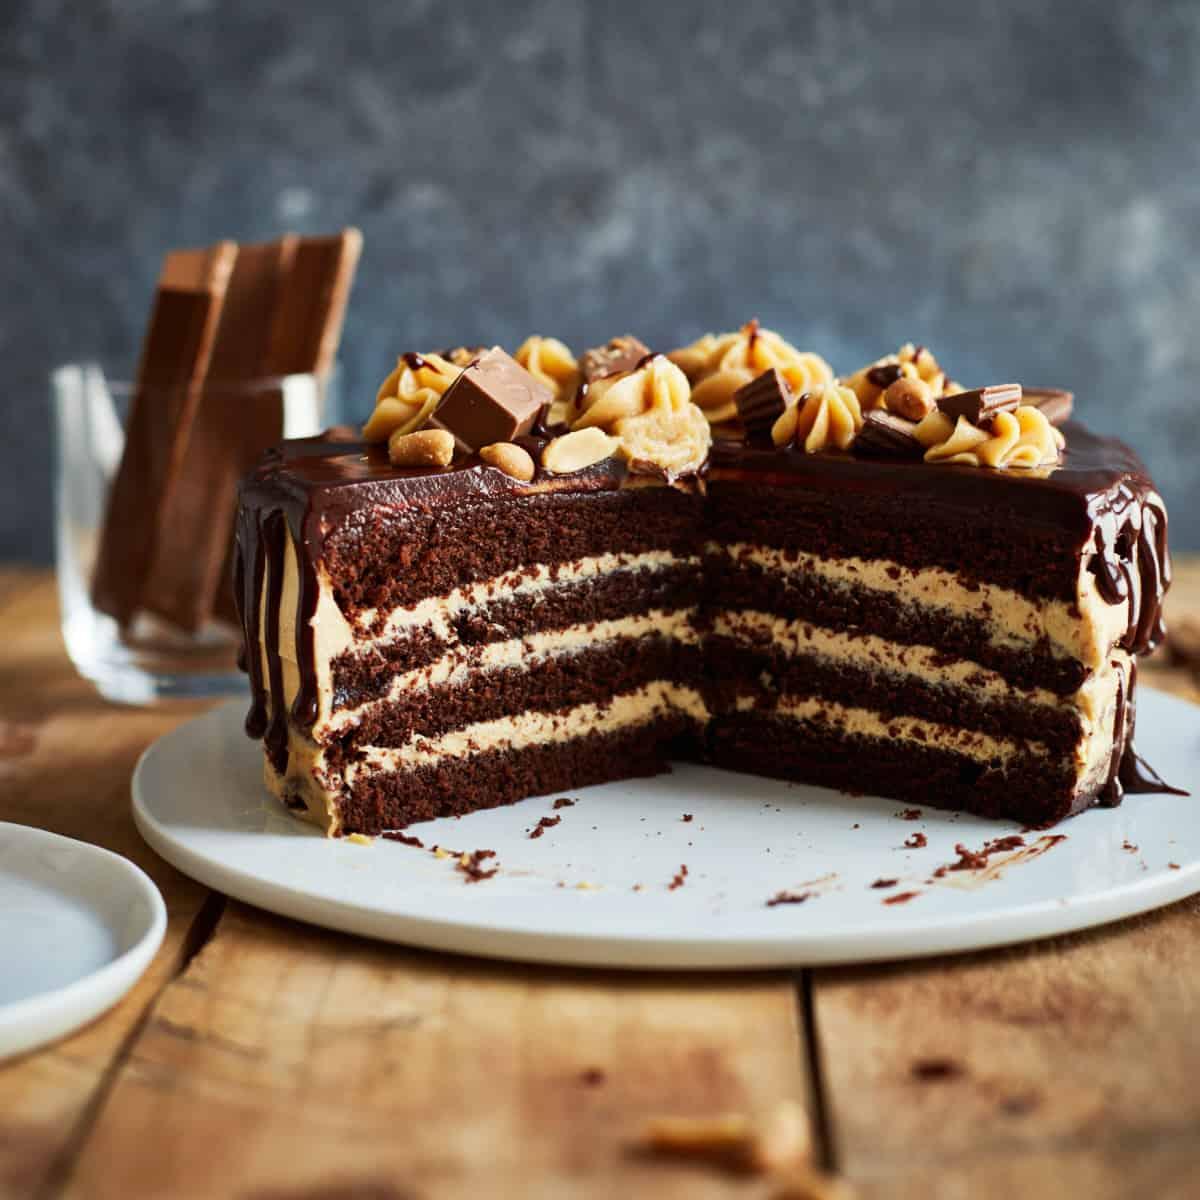 Cut peanut butter chocolate cake on a cake plate